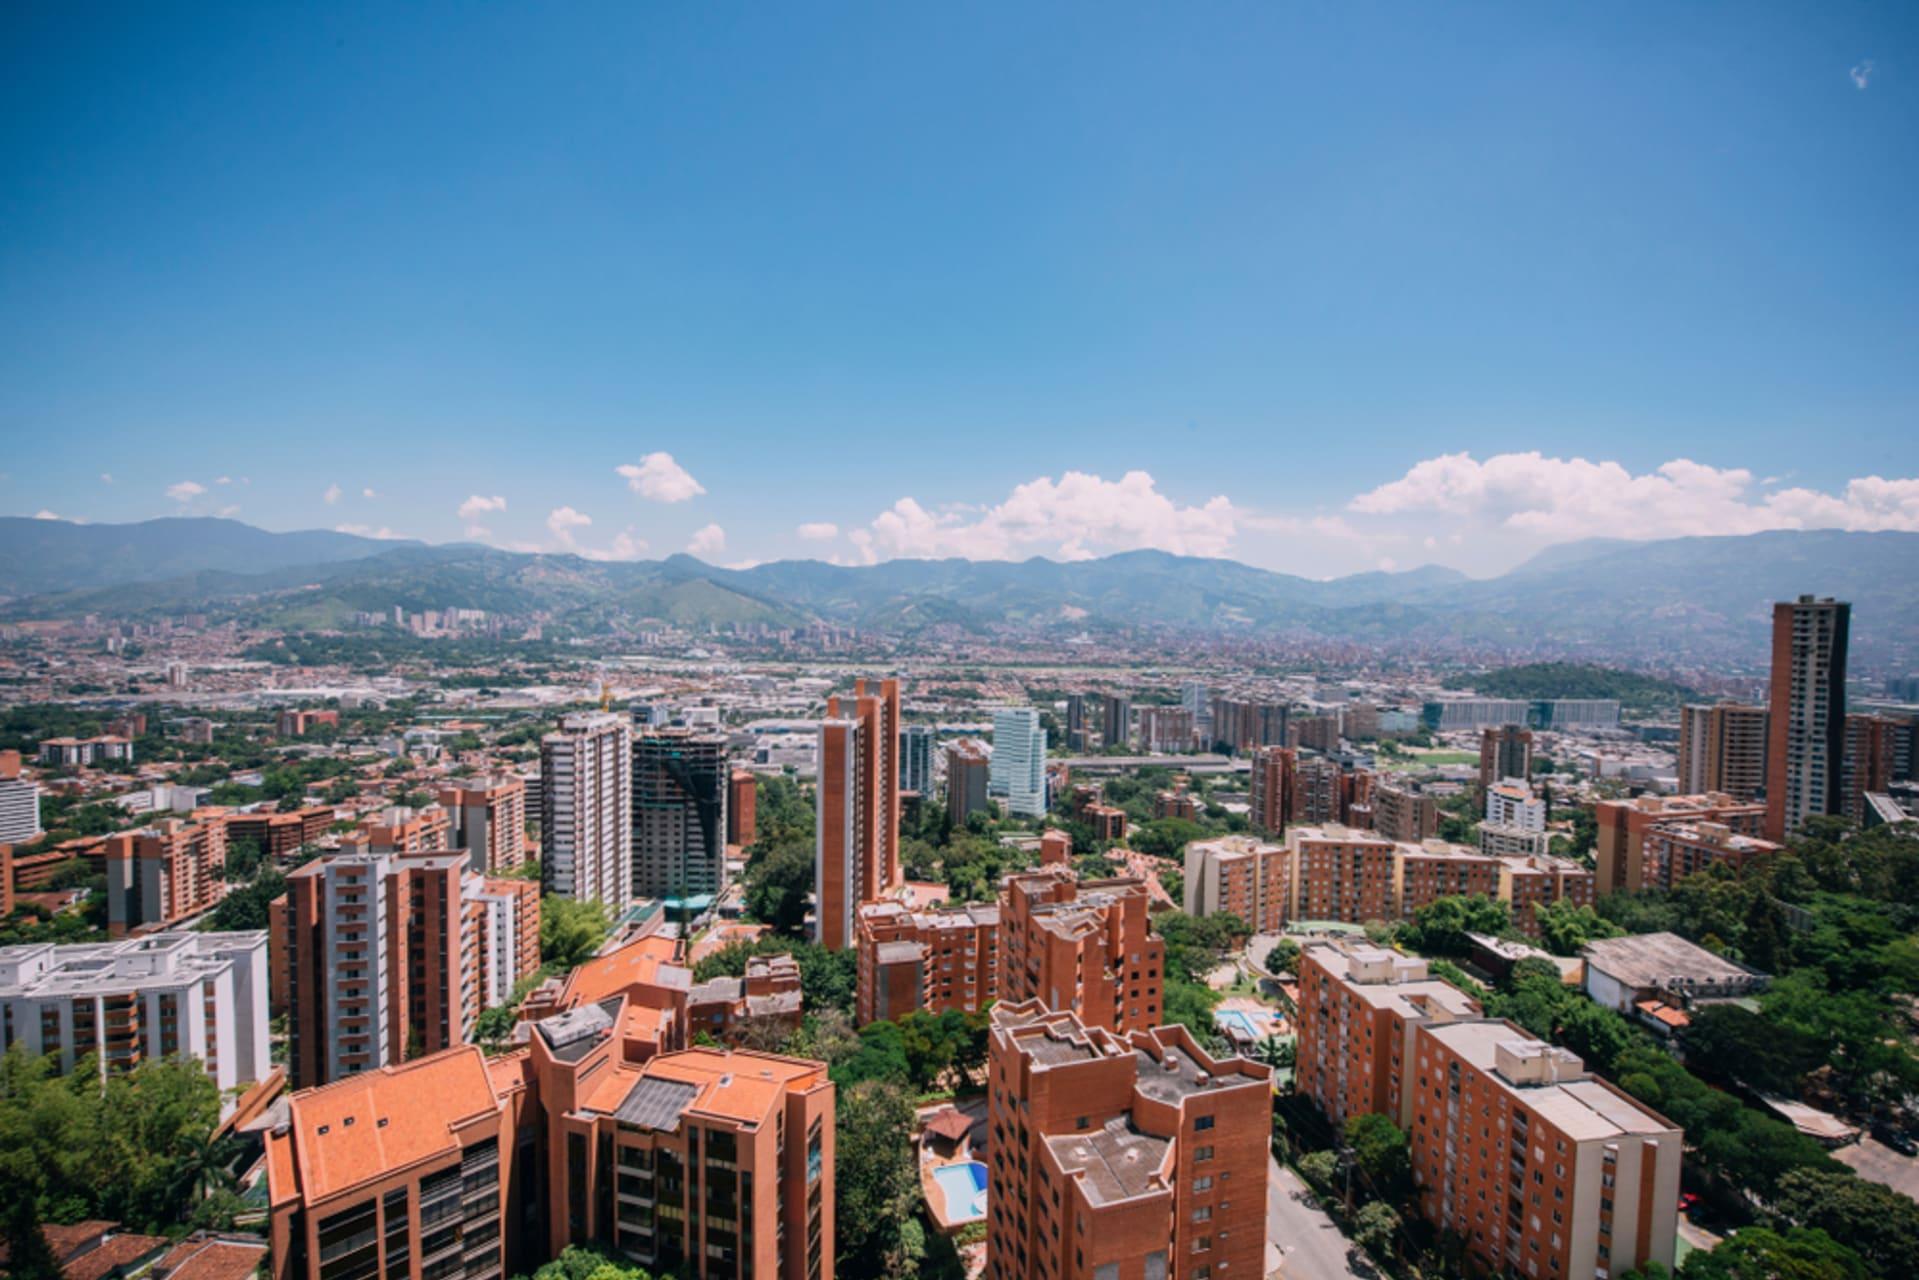 Medellín - Walking around Medellín Neighborhoods